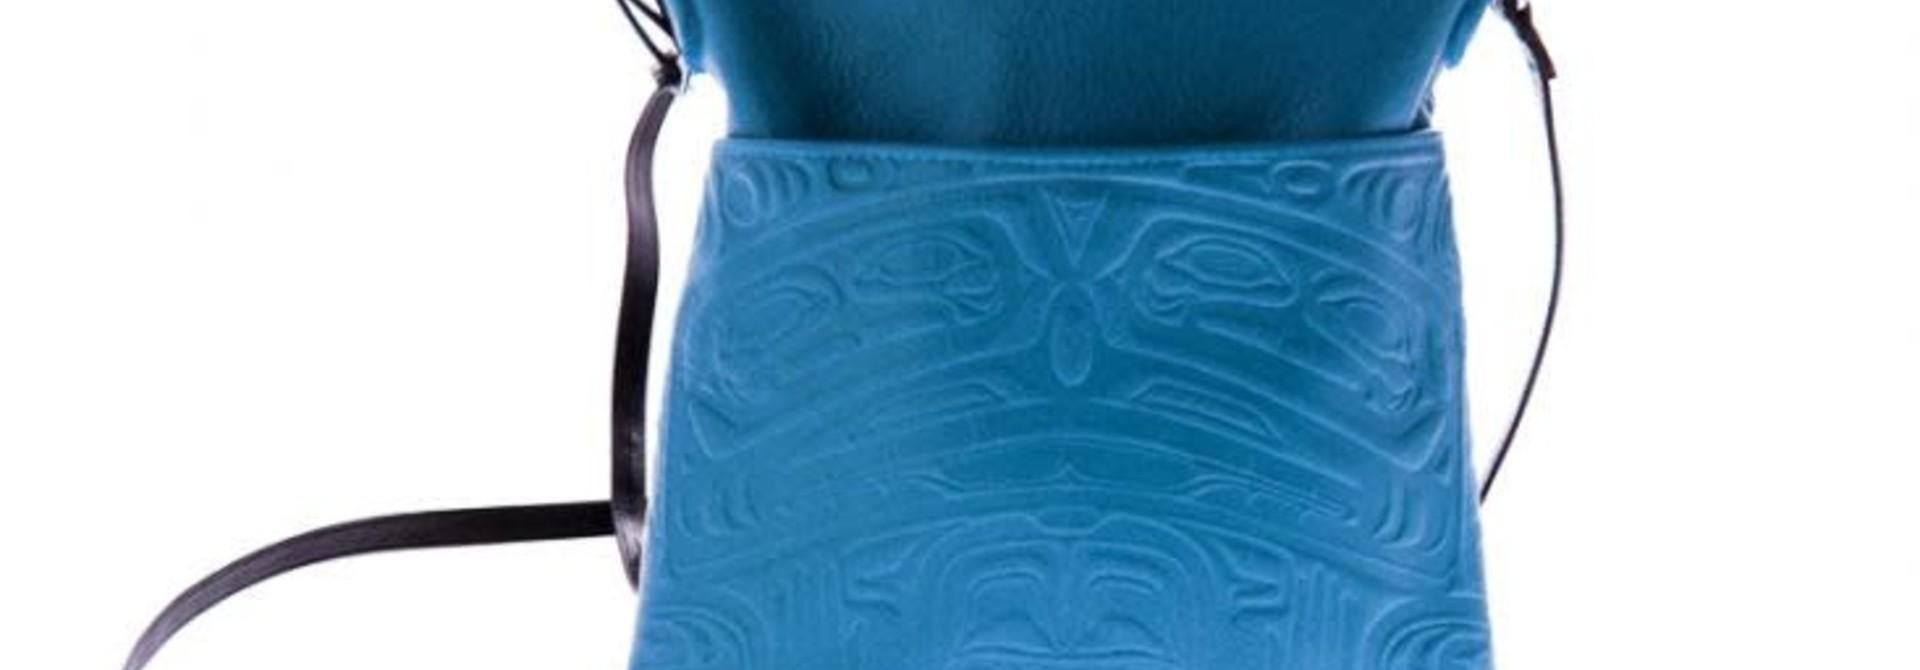 Solo Bag Deerskin - Bear Box Design